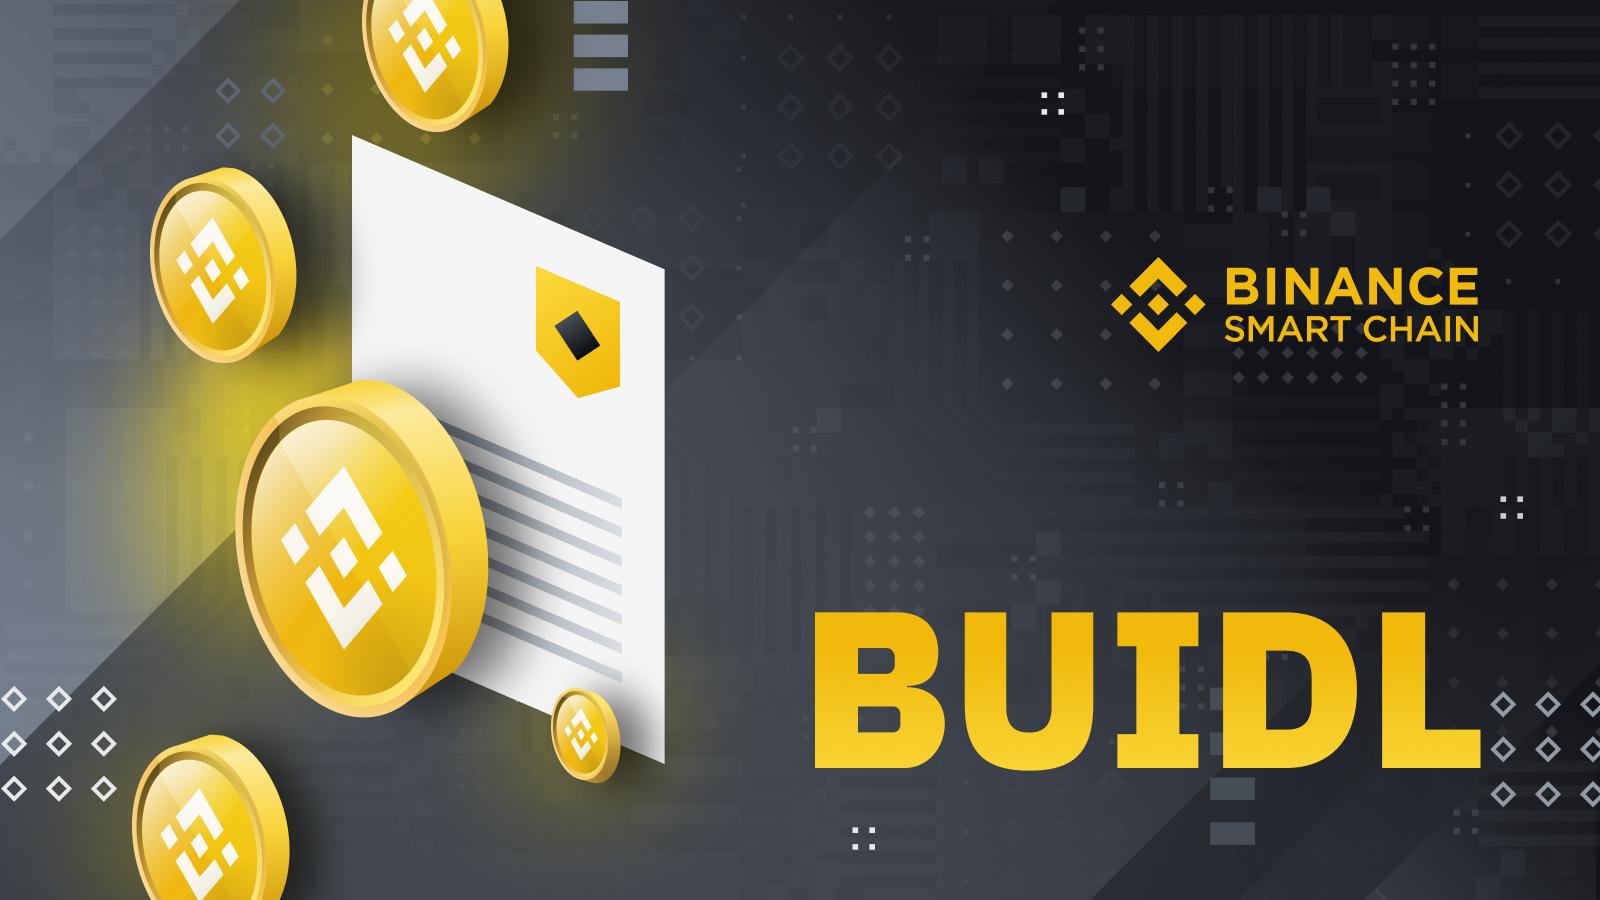 BUIDL Rewards Program: July 2021